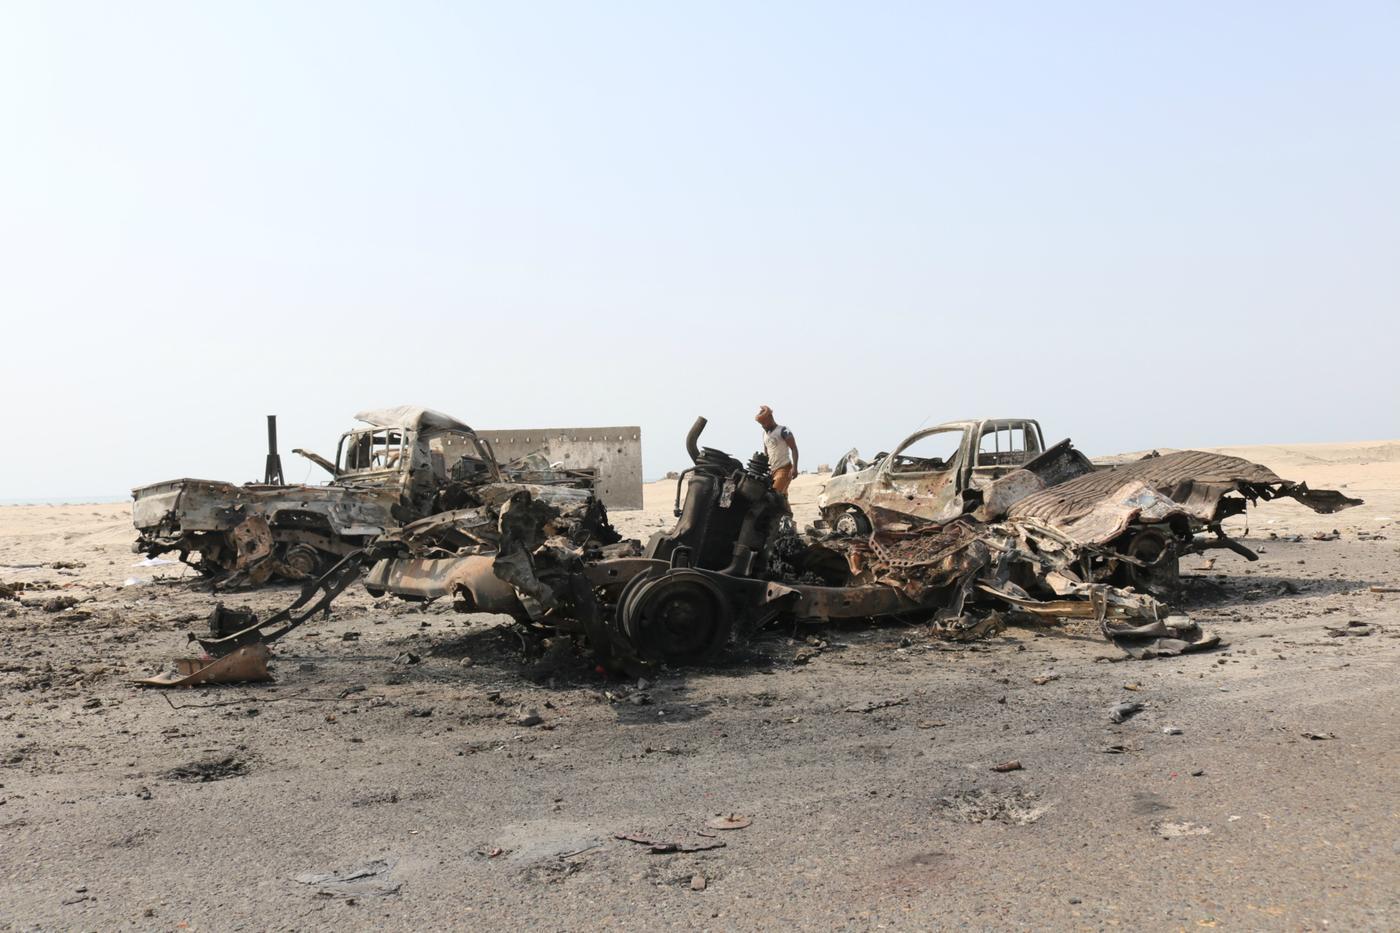 Yemen: UAE-backed forces regain control of Aden